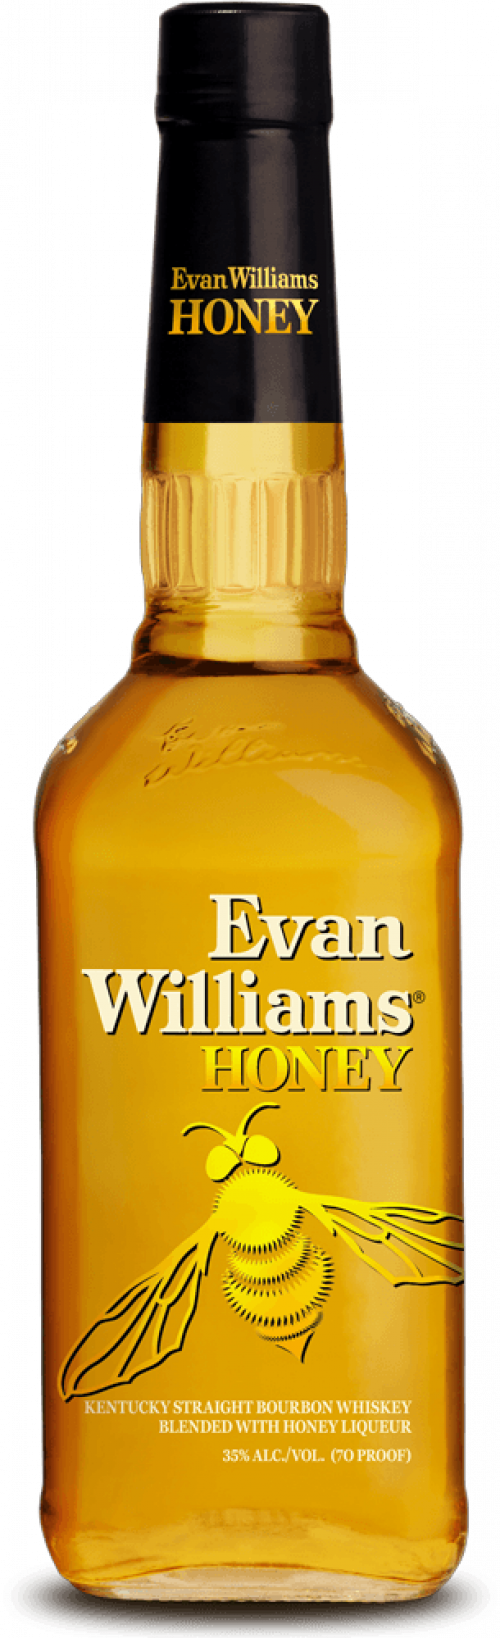 Evan Williams Honey 750ml